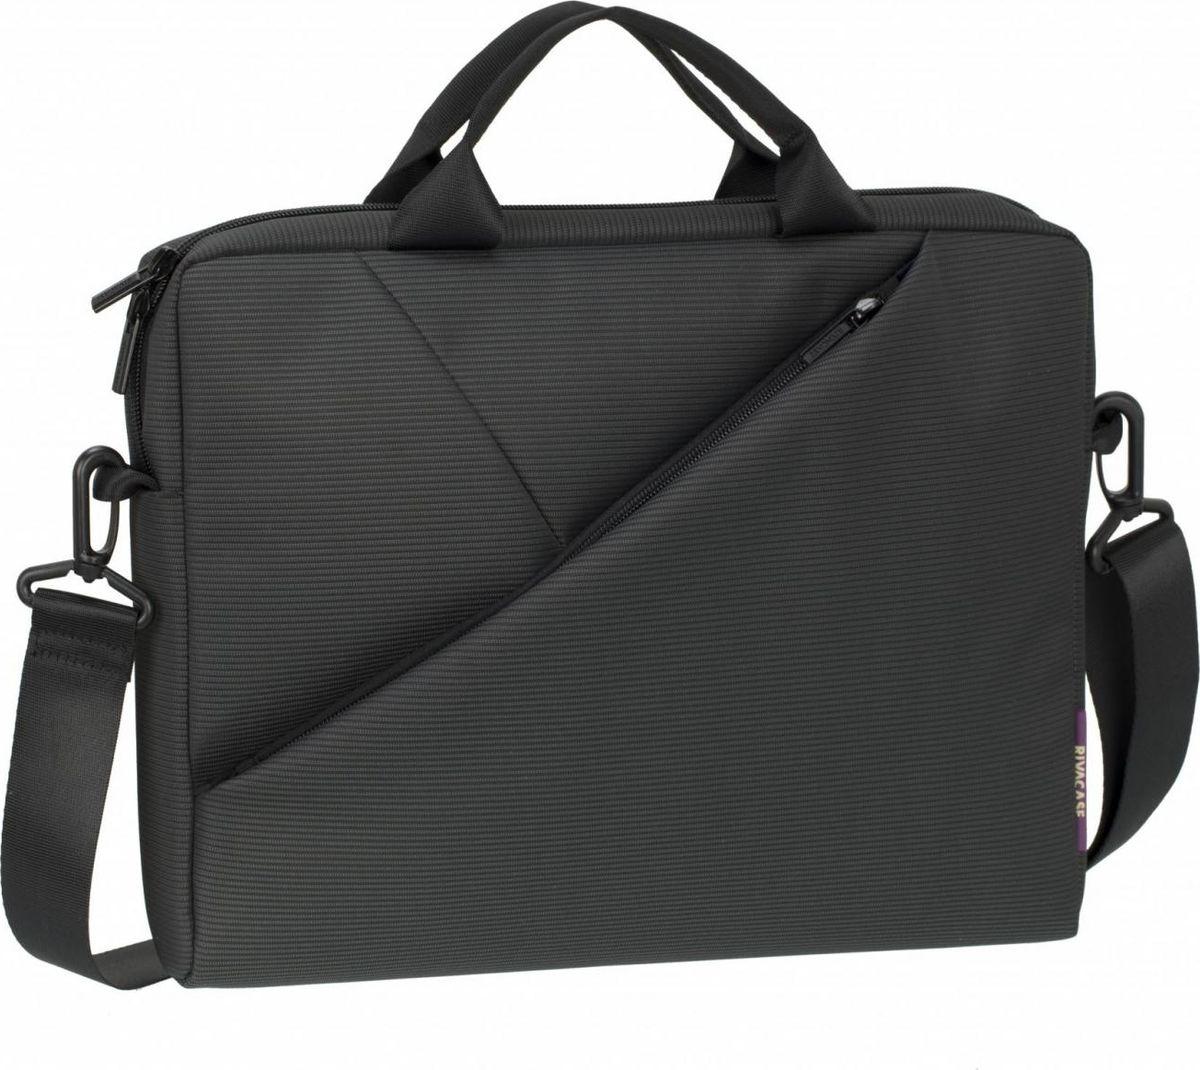 RivaCase 8730, Grey сумка для ноутбука 15,6 аксессуар сумка 15 6 rivacase 8730 grey